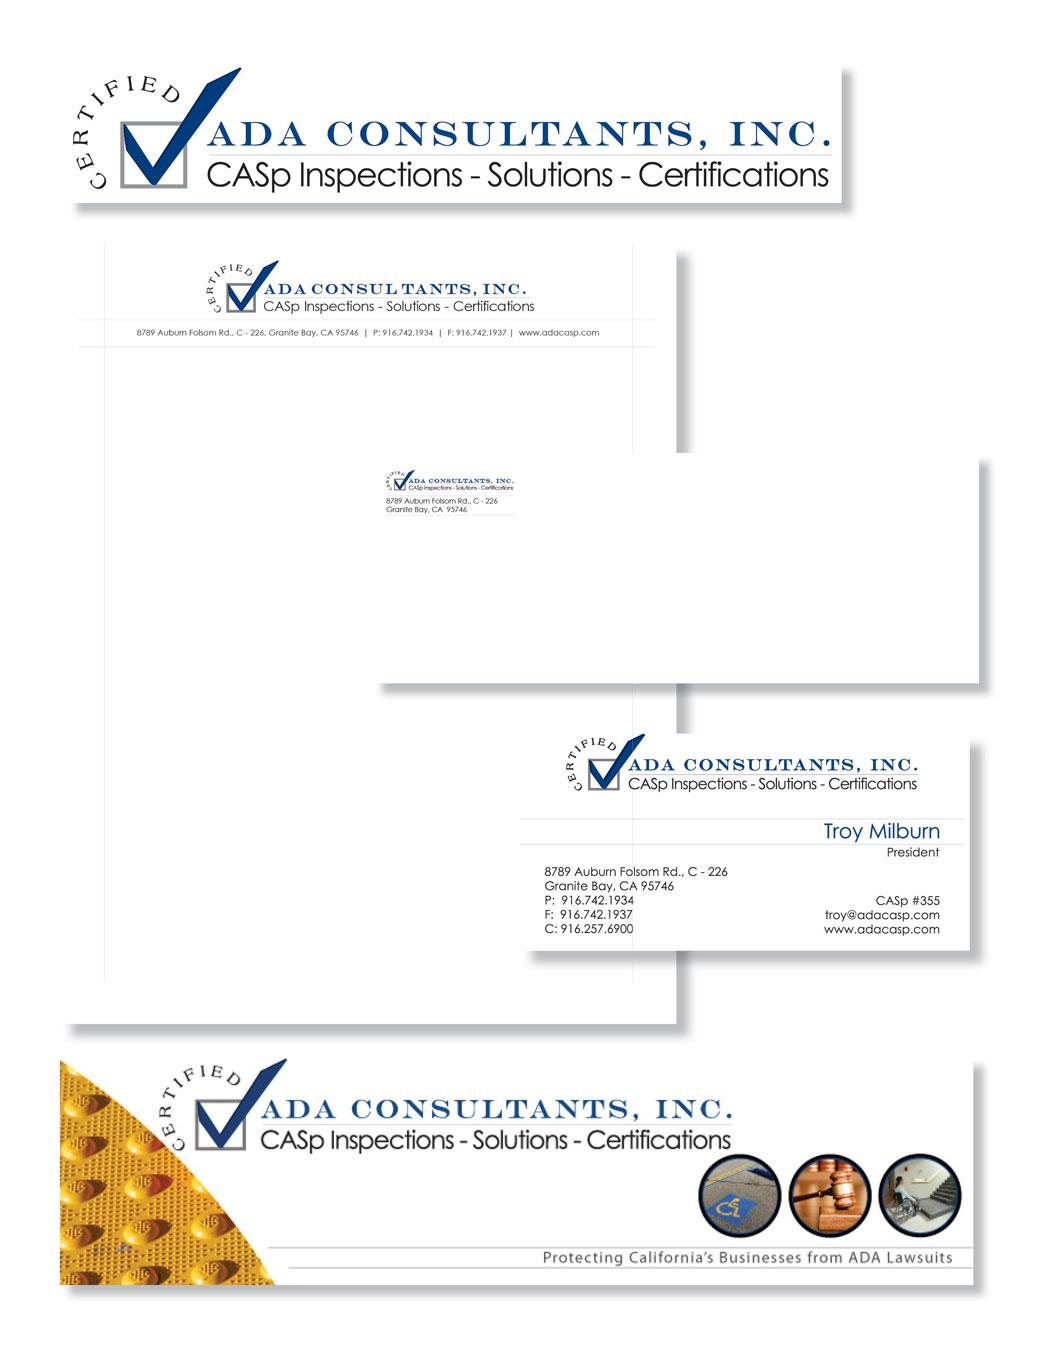 ADA-Consultants-web.jpg